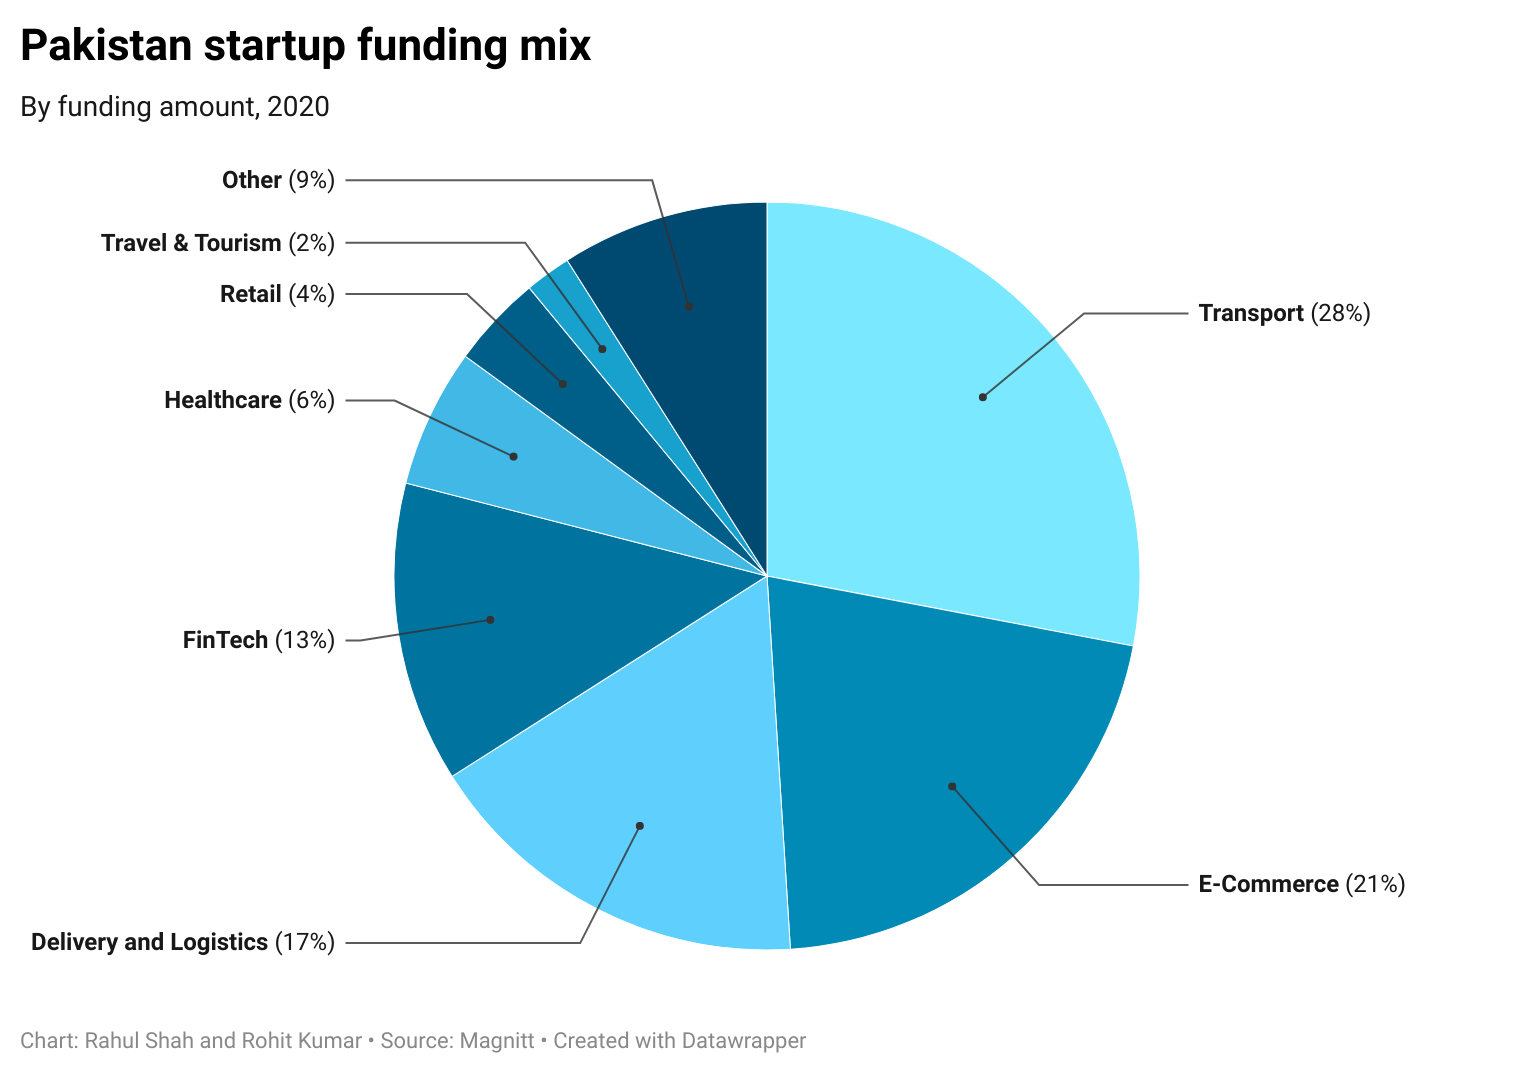 Pakistan startup funding mix